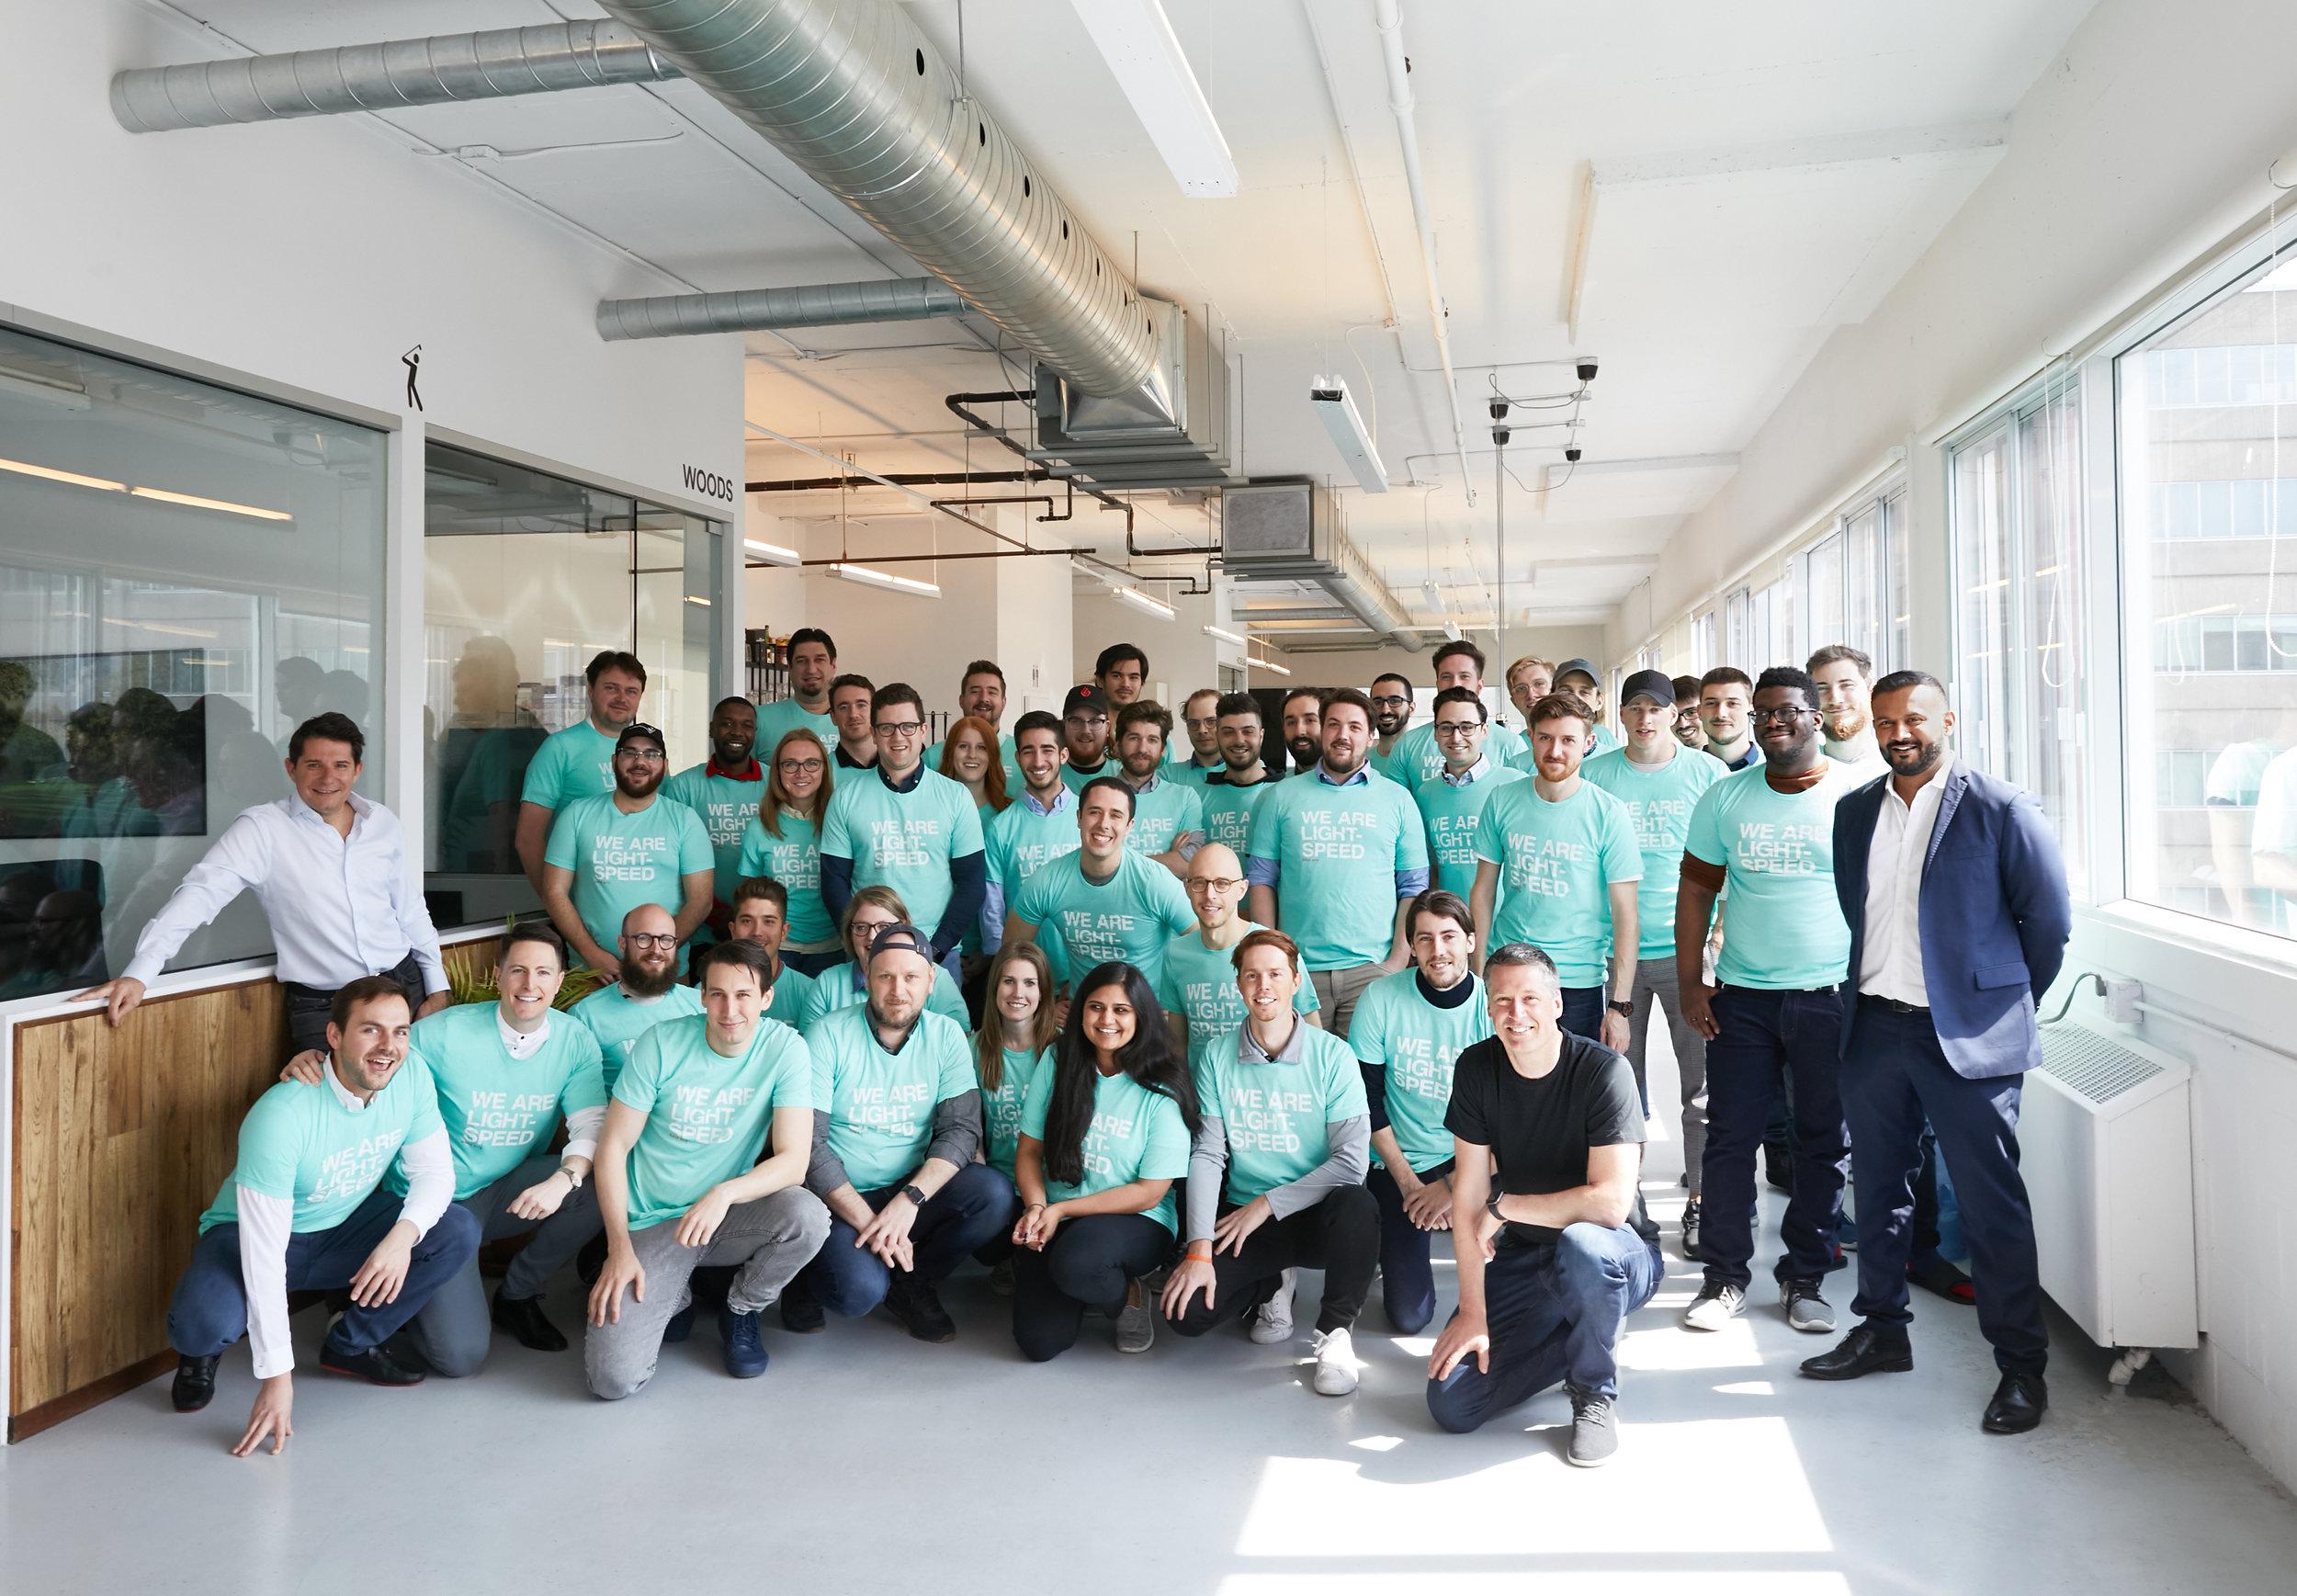 Chronogolf team with Lightspeed CEO Dax Dasilva (far right), Lightspeed president JP Chauvet (Far Left) and Lightspeed CFO Brandon Nussey (black shirt, front of photo) in Montreal. Photo: Lightspeed